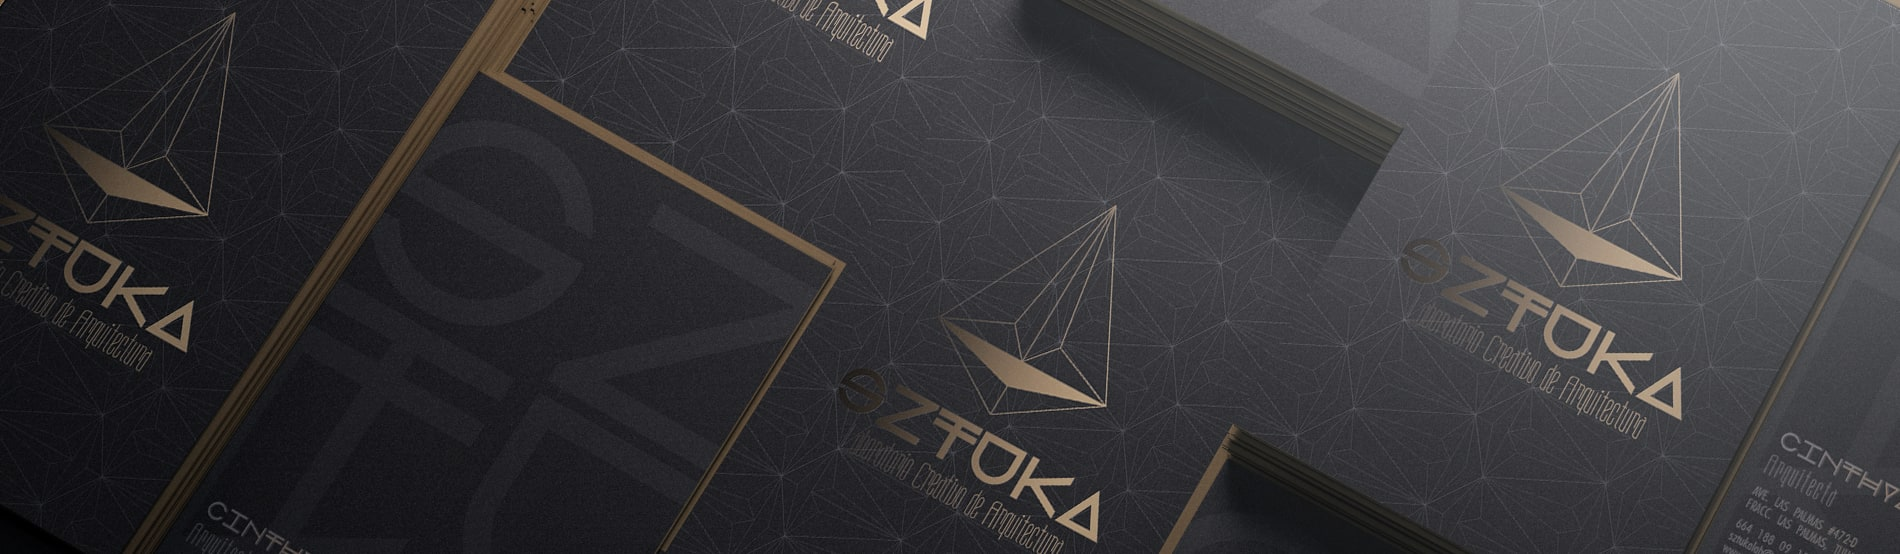 SZTUKA  Laboratorio Creativo de Arquitectura